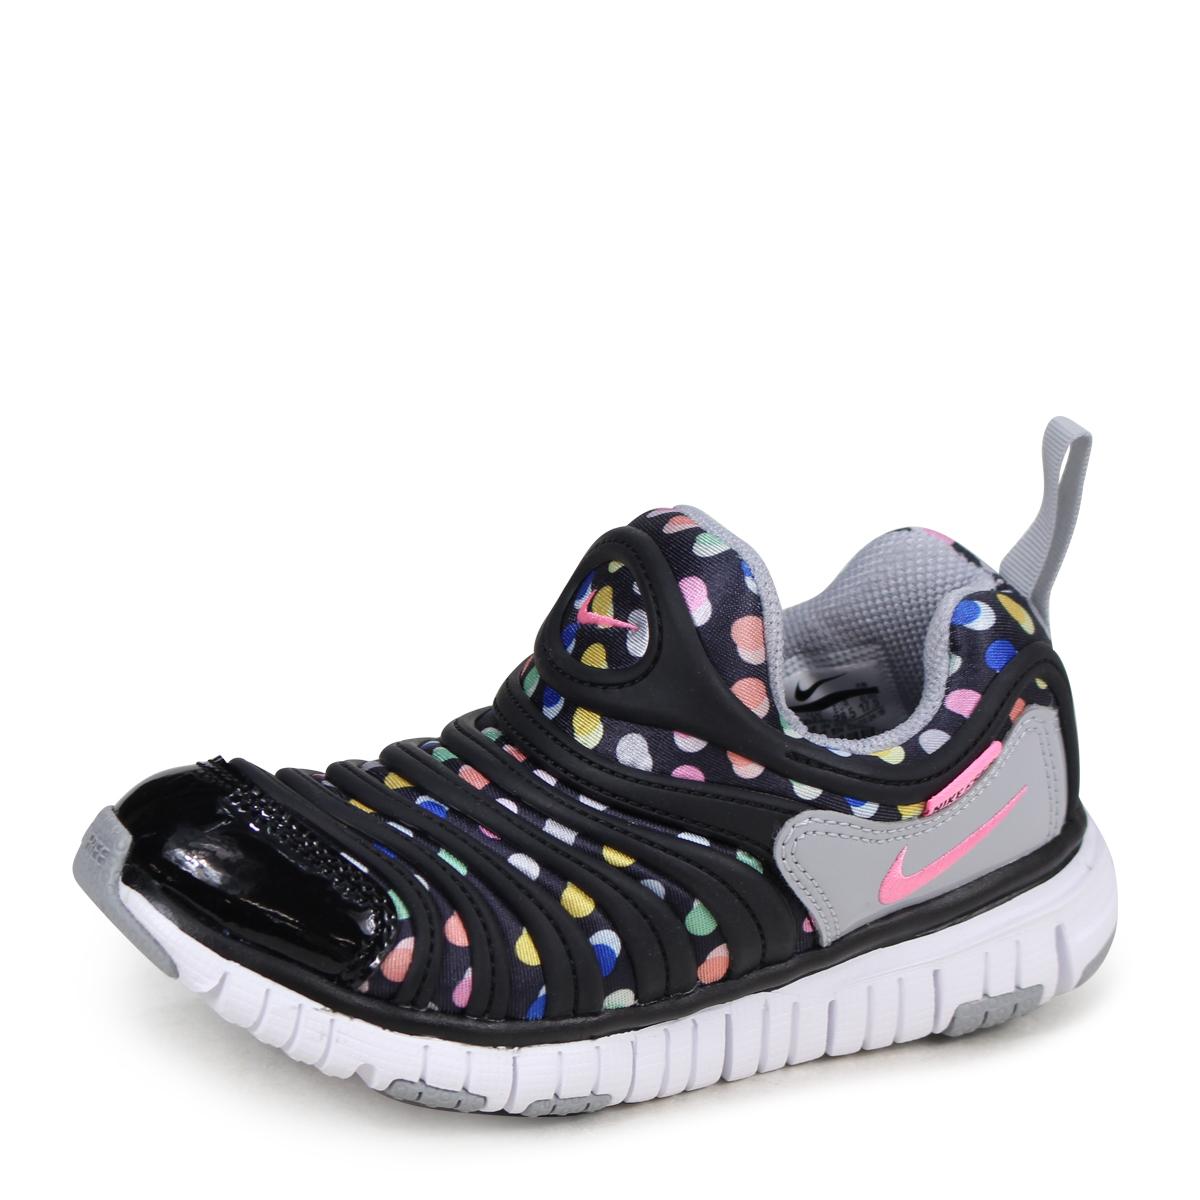 4ea35b0cb8fc ALLSPORTS  NIKE DYNAMO FREE PRINT PS Nike dynamo-free kids sneakers ...